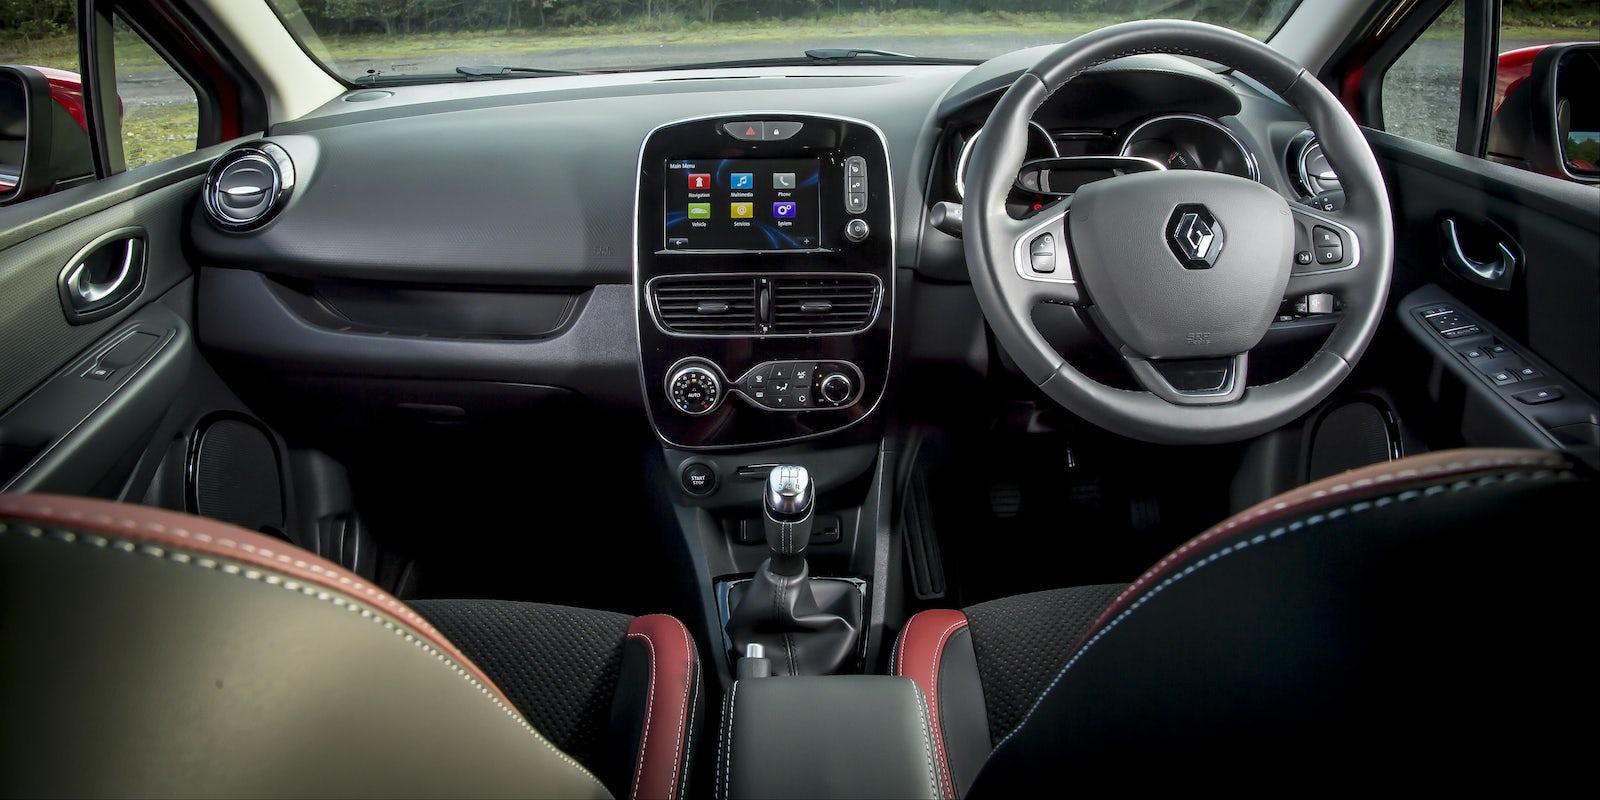 Renault Clio Interior & Infotainment | carwow